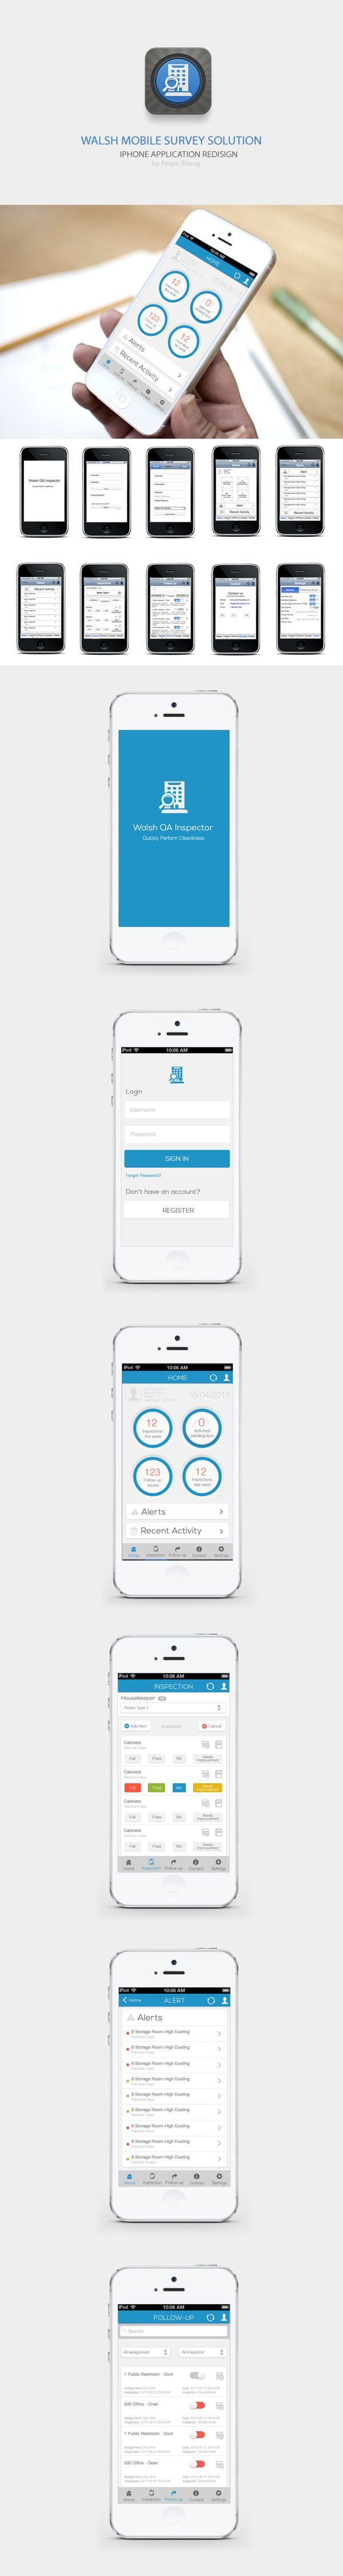 Inspector App for Iphone Ios7 Style by Pq Z, via Behance *** #app #gui #ui #behance